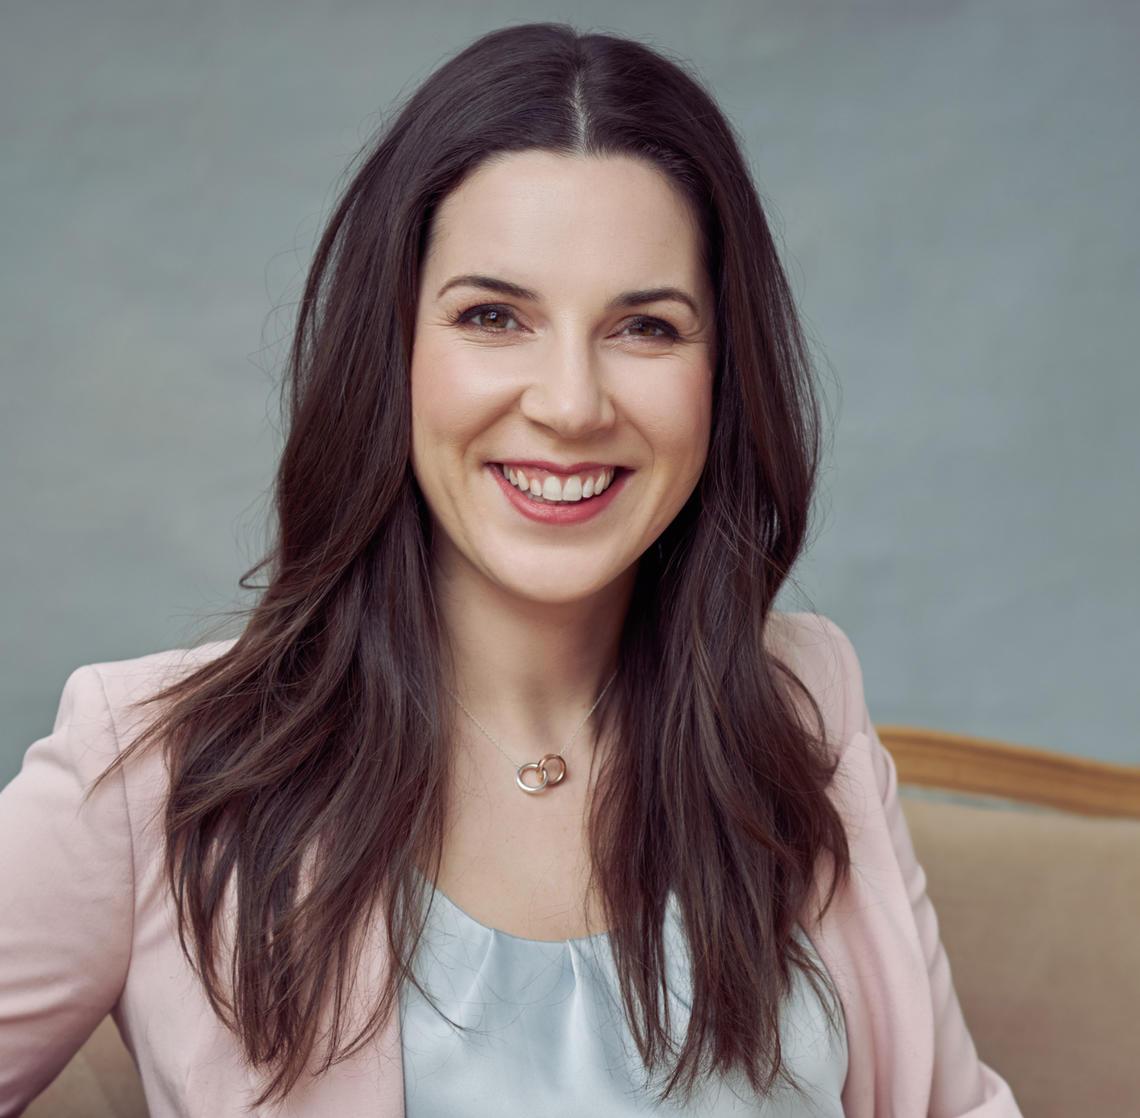 Dr. Lisa Belanger, PhD a post-doctoral scholar at the Haskayne School of Business